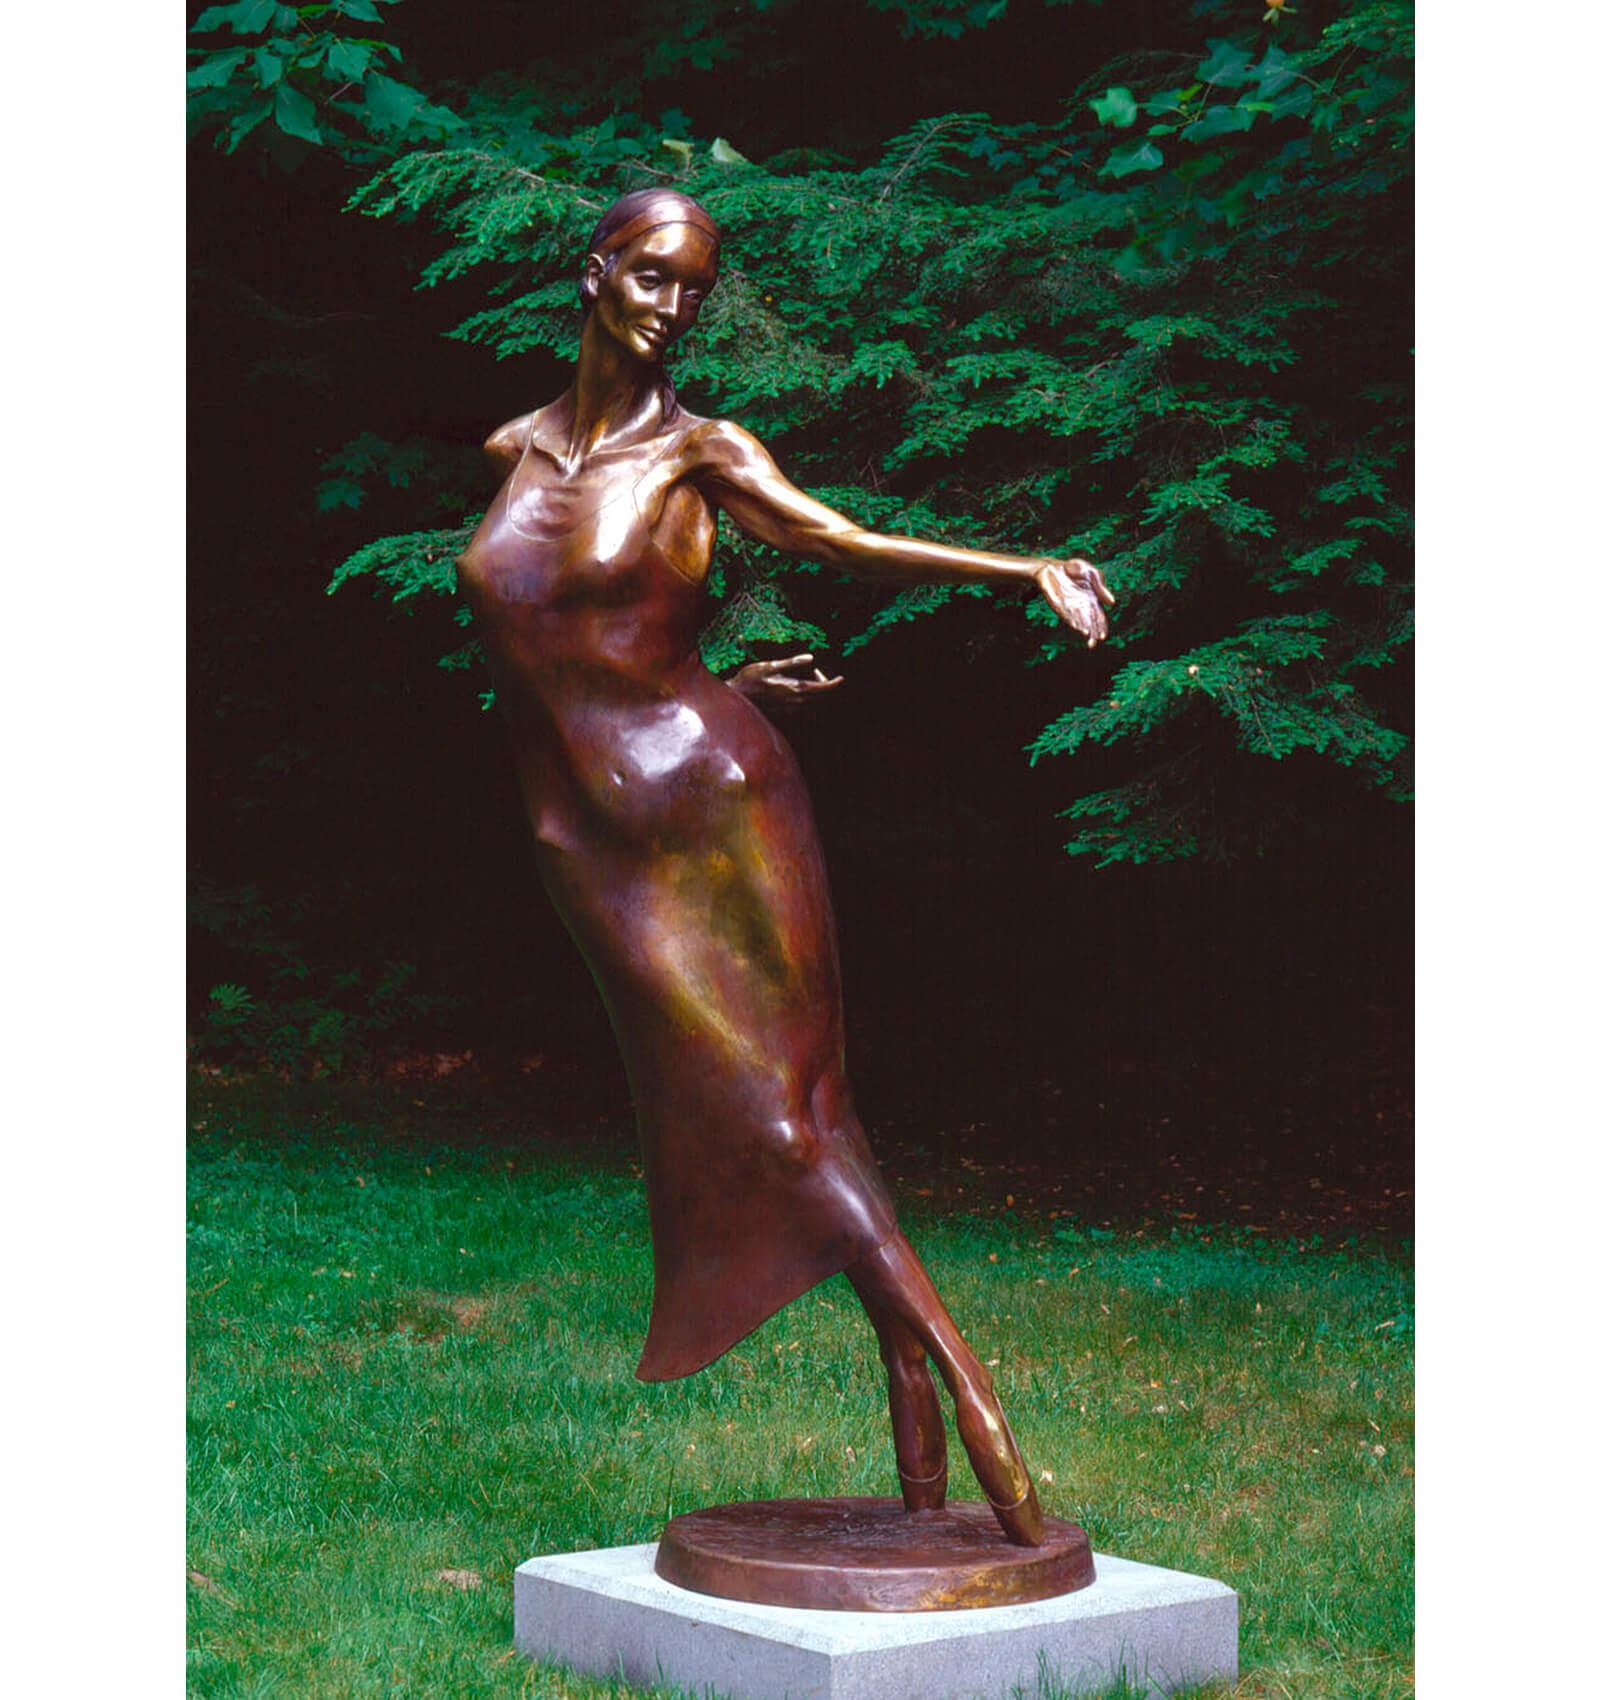 Nocturne a Life size Bronze Figurative ballet dancer Outdoor Garden Sculpture by Andrew DeVries